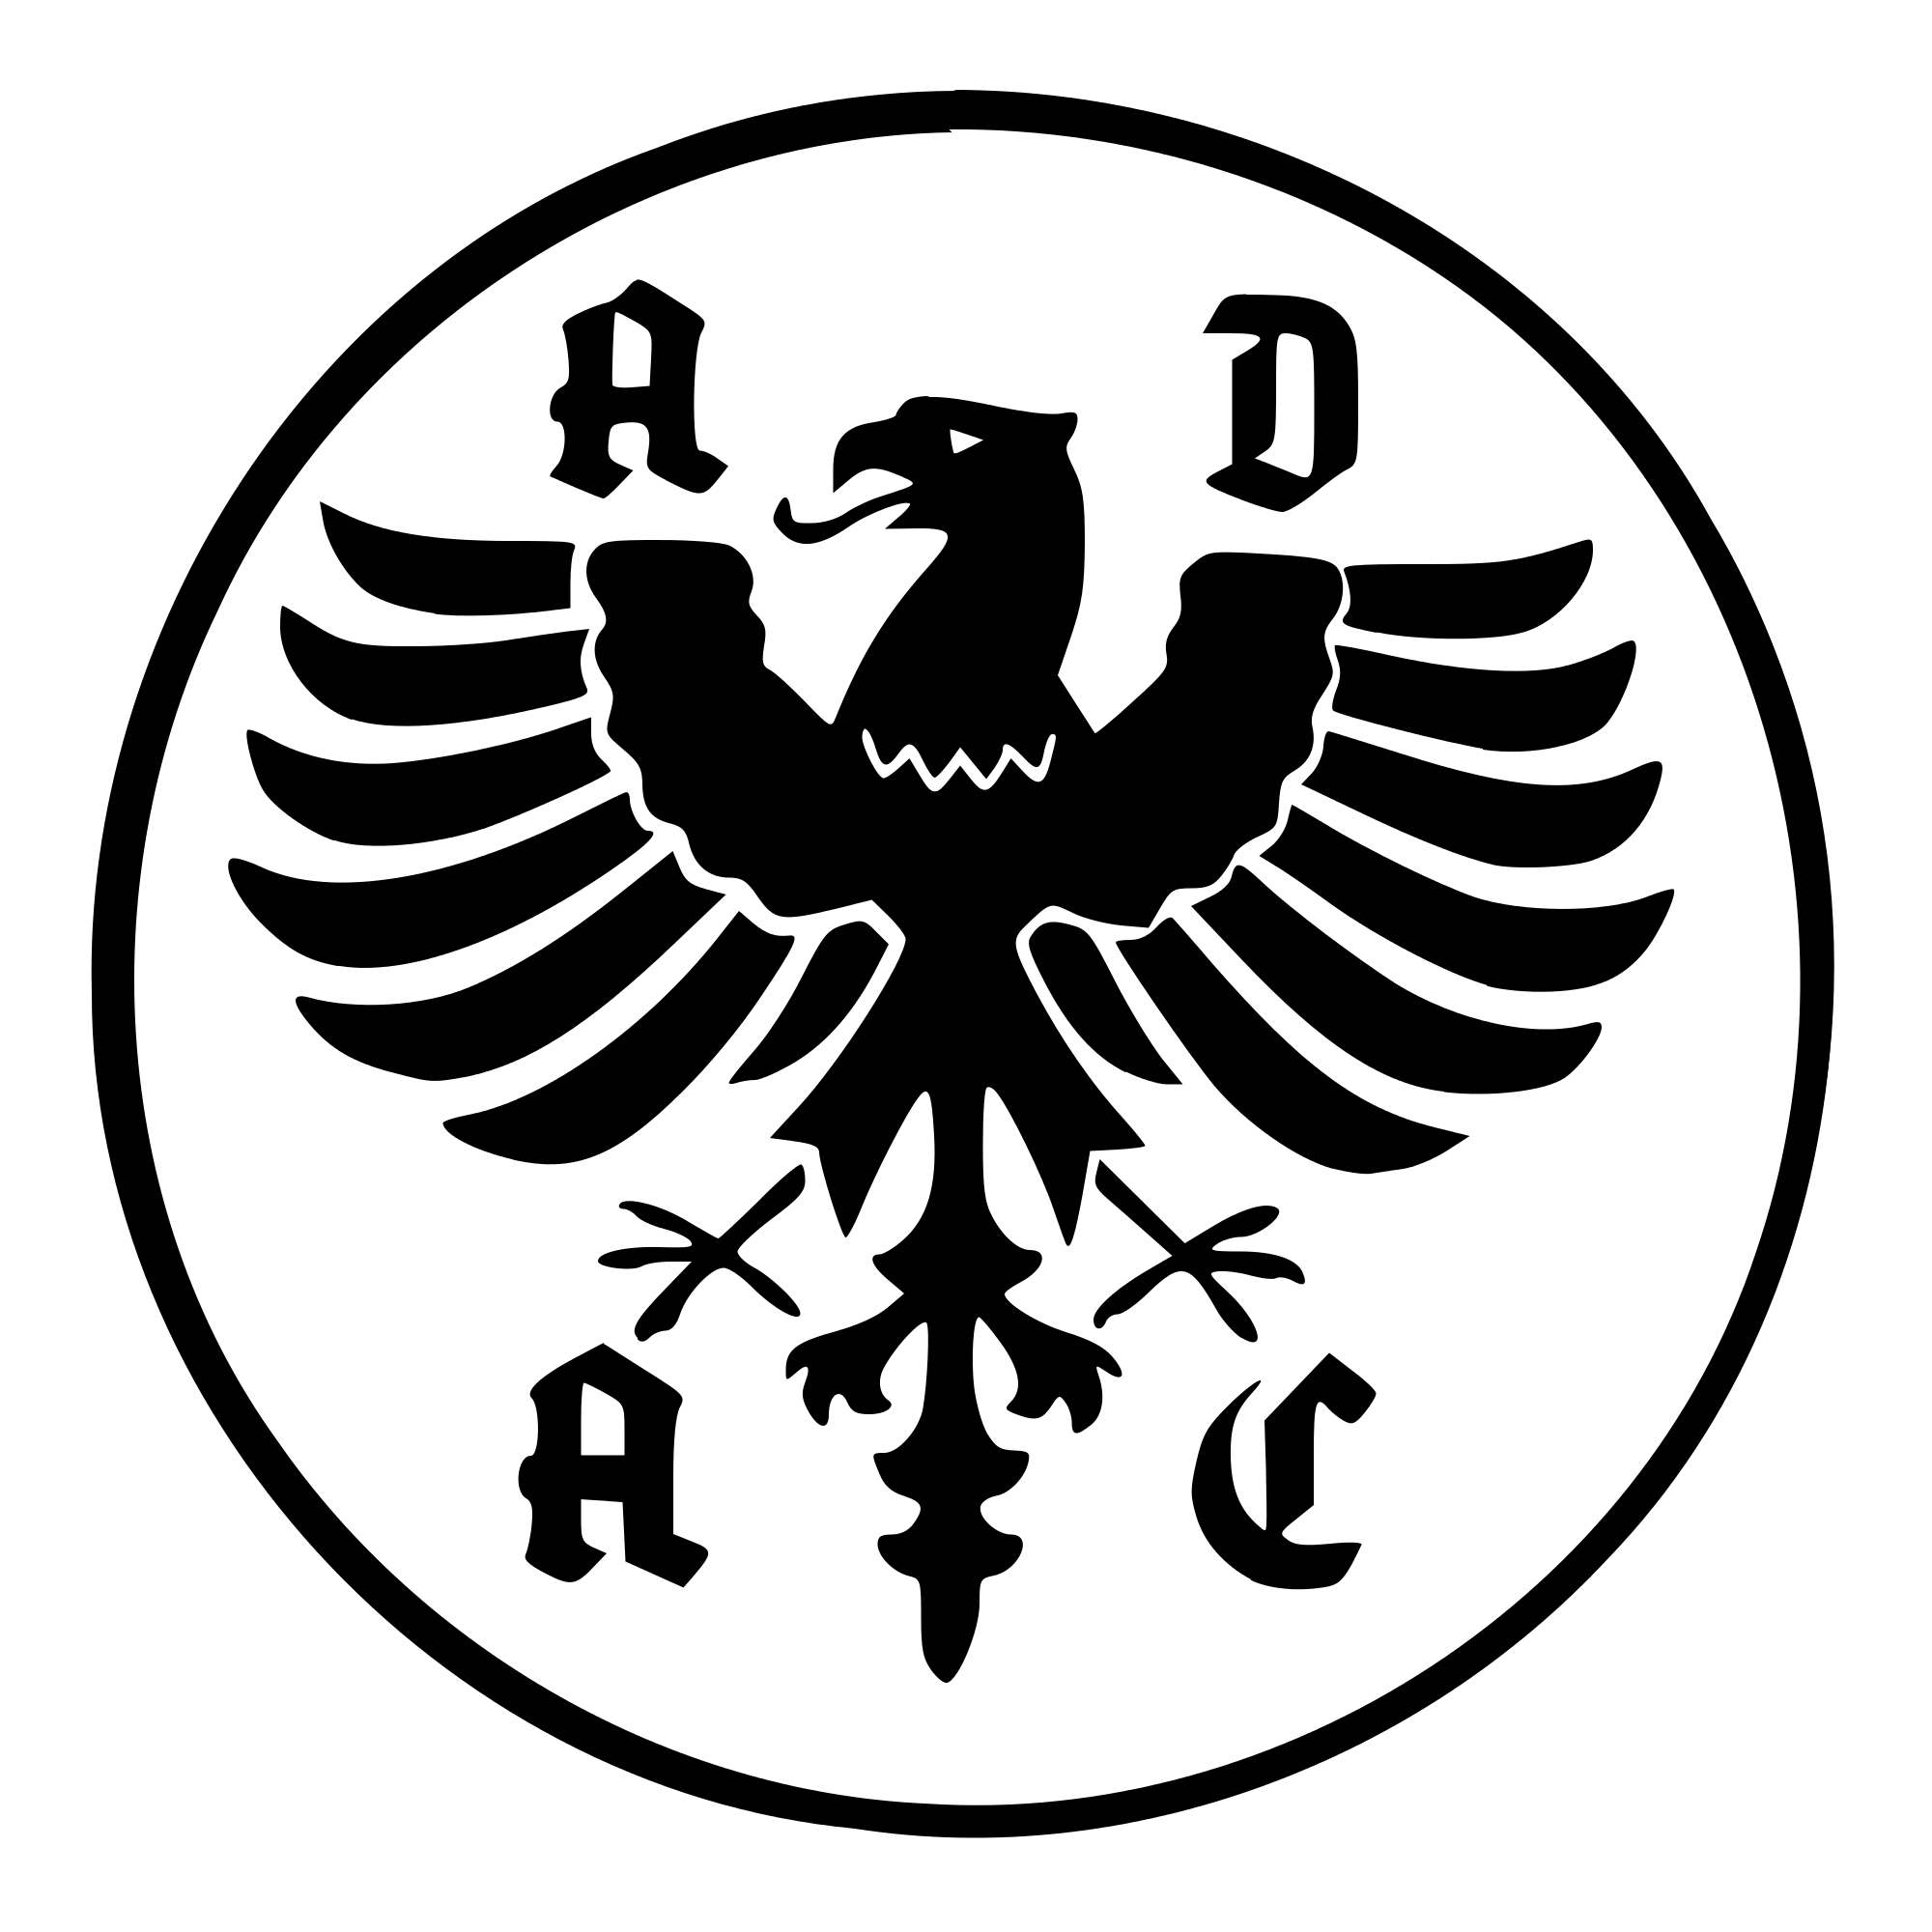 Open PlusPng.com  - Adac Vector PNG